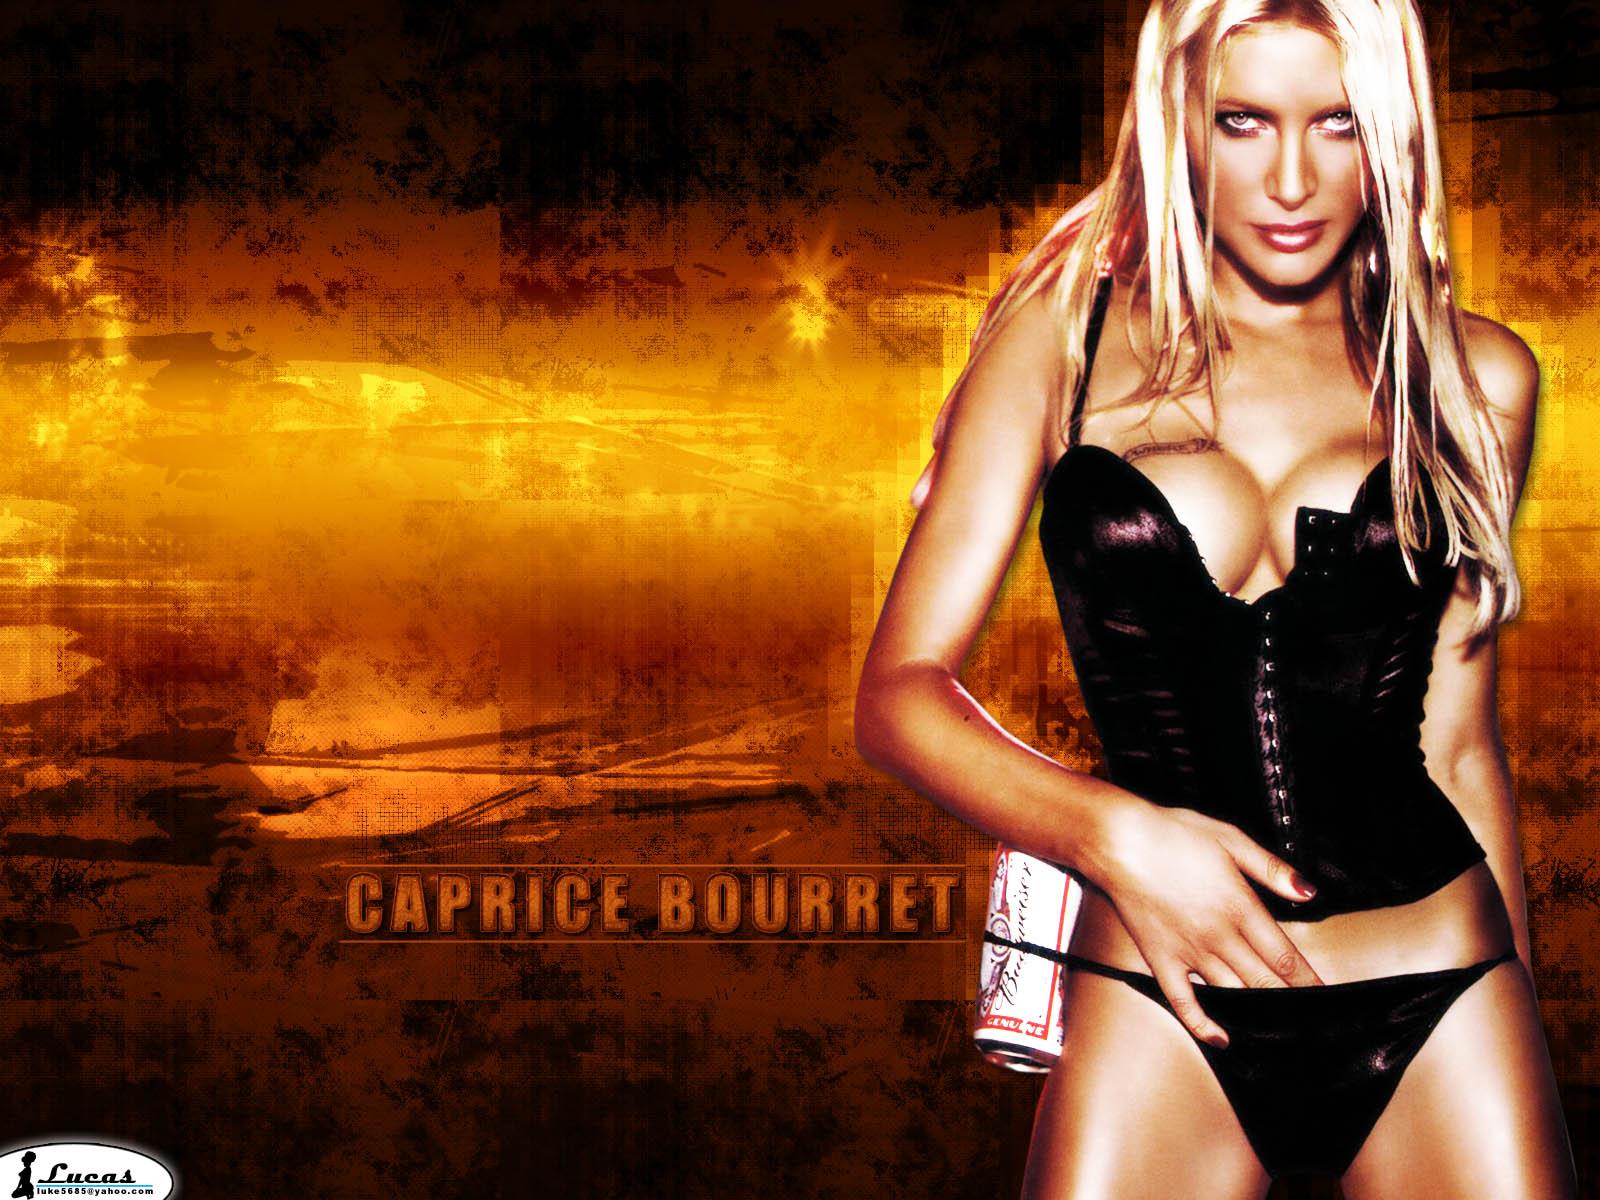 http://fxpaper.fatalsystem.com/images/wallpapers/celebs/caprice-bourret/caprice_bourret_33.jpg